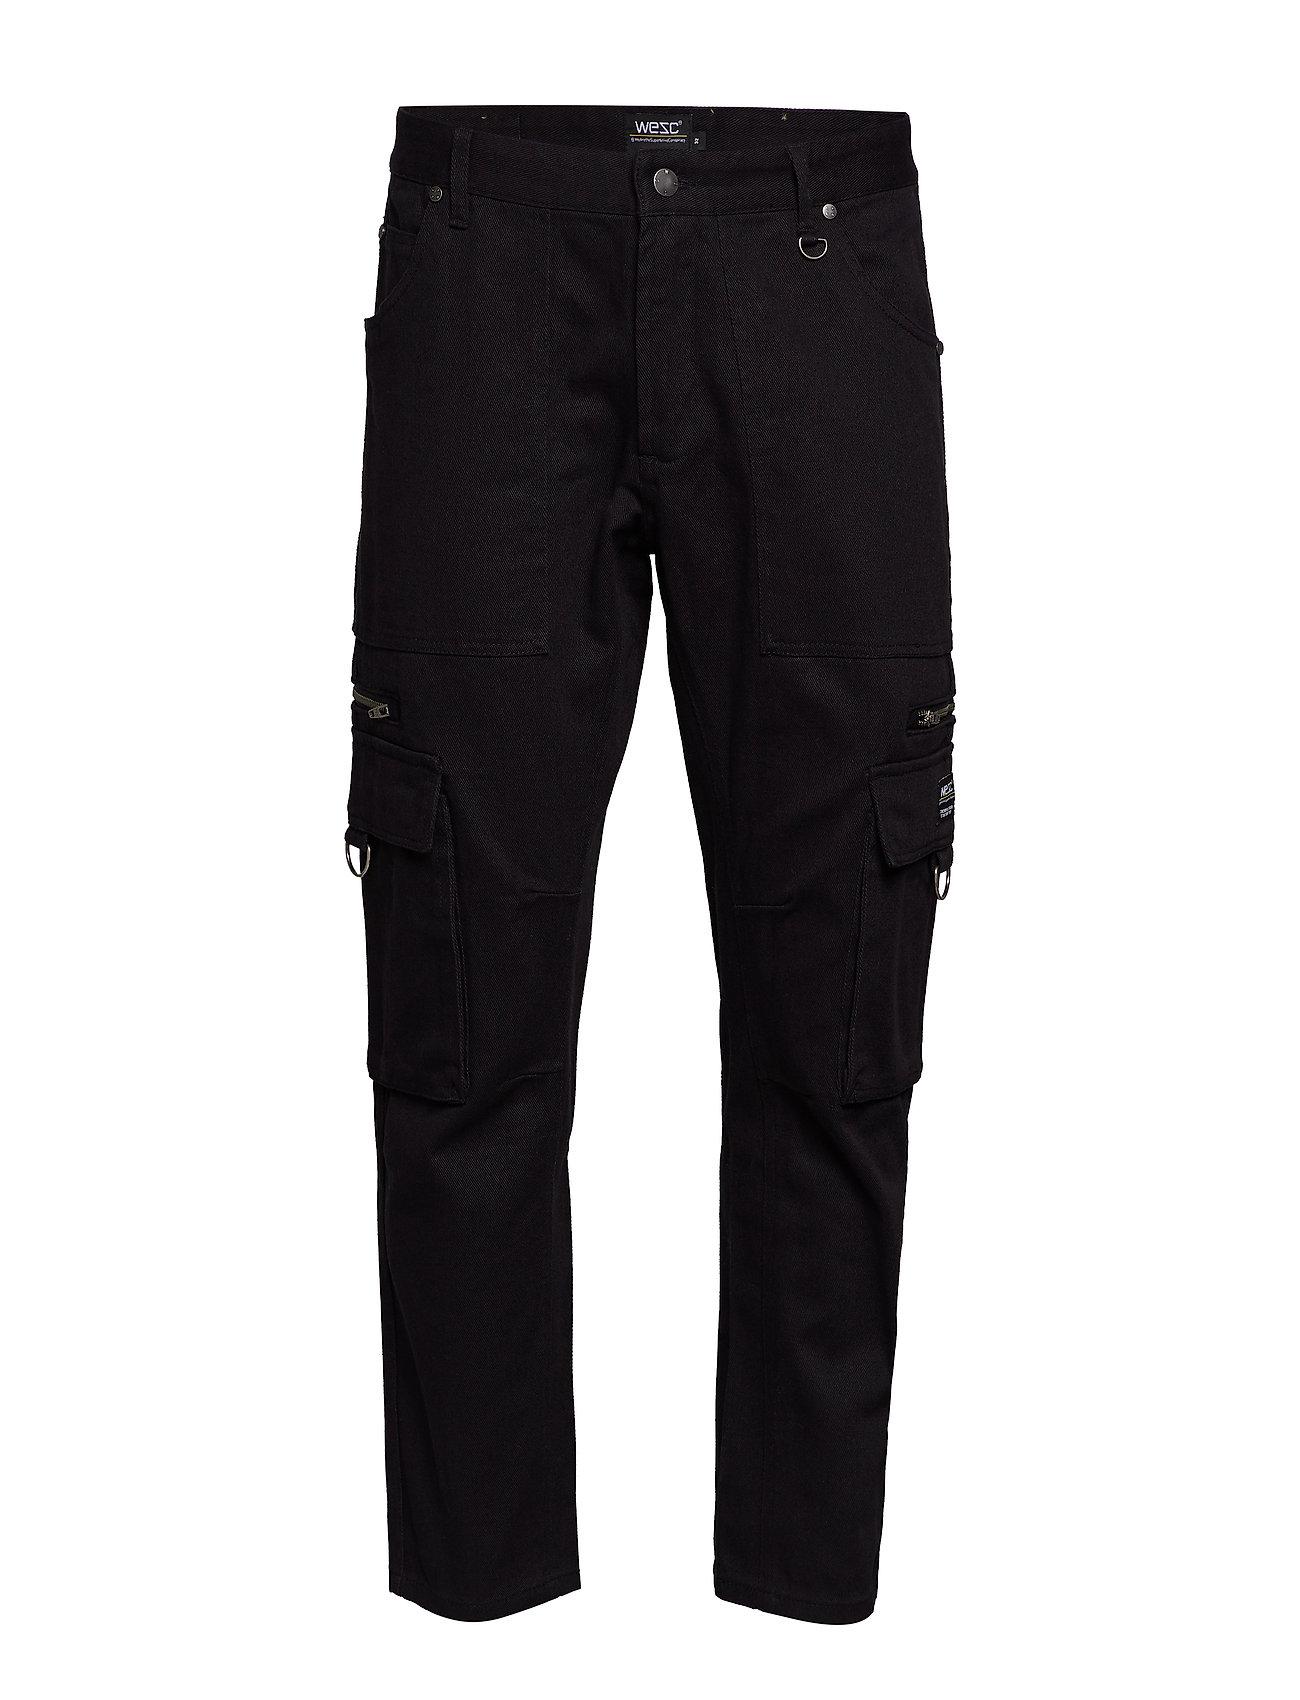 WeSC Tapered Utility Pant - BLACK